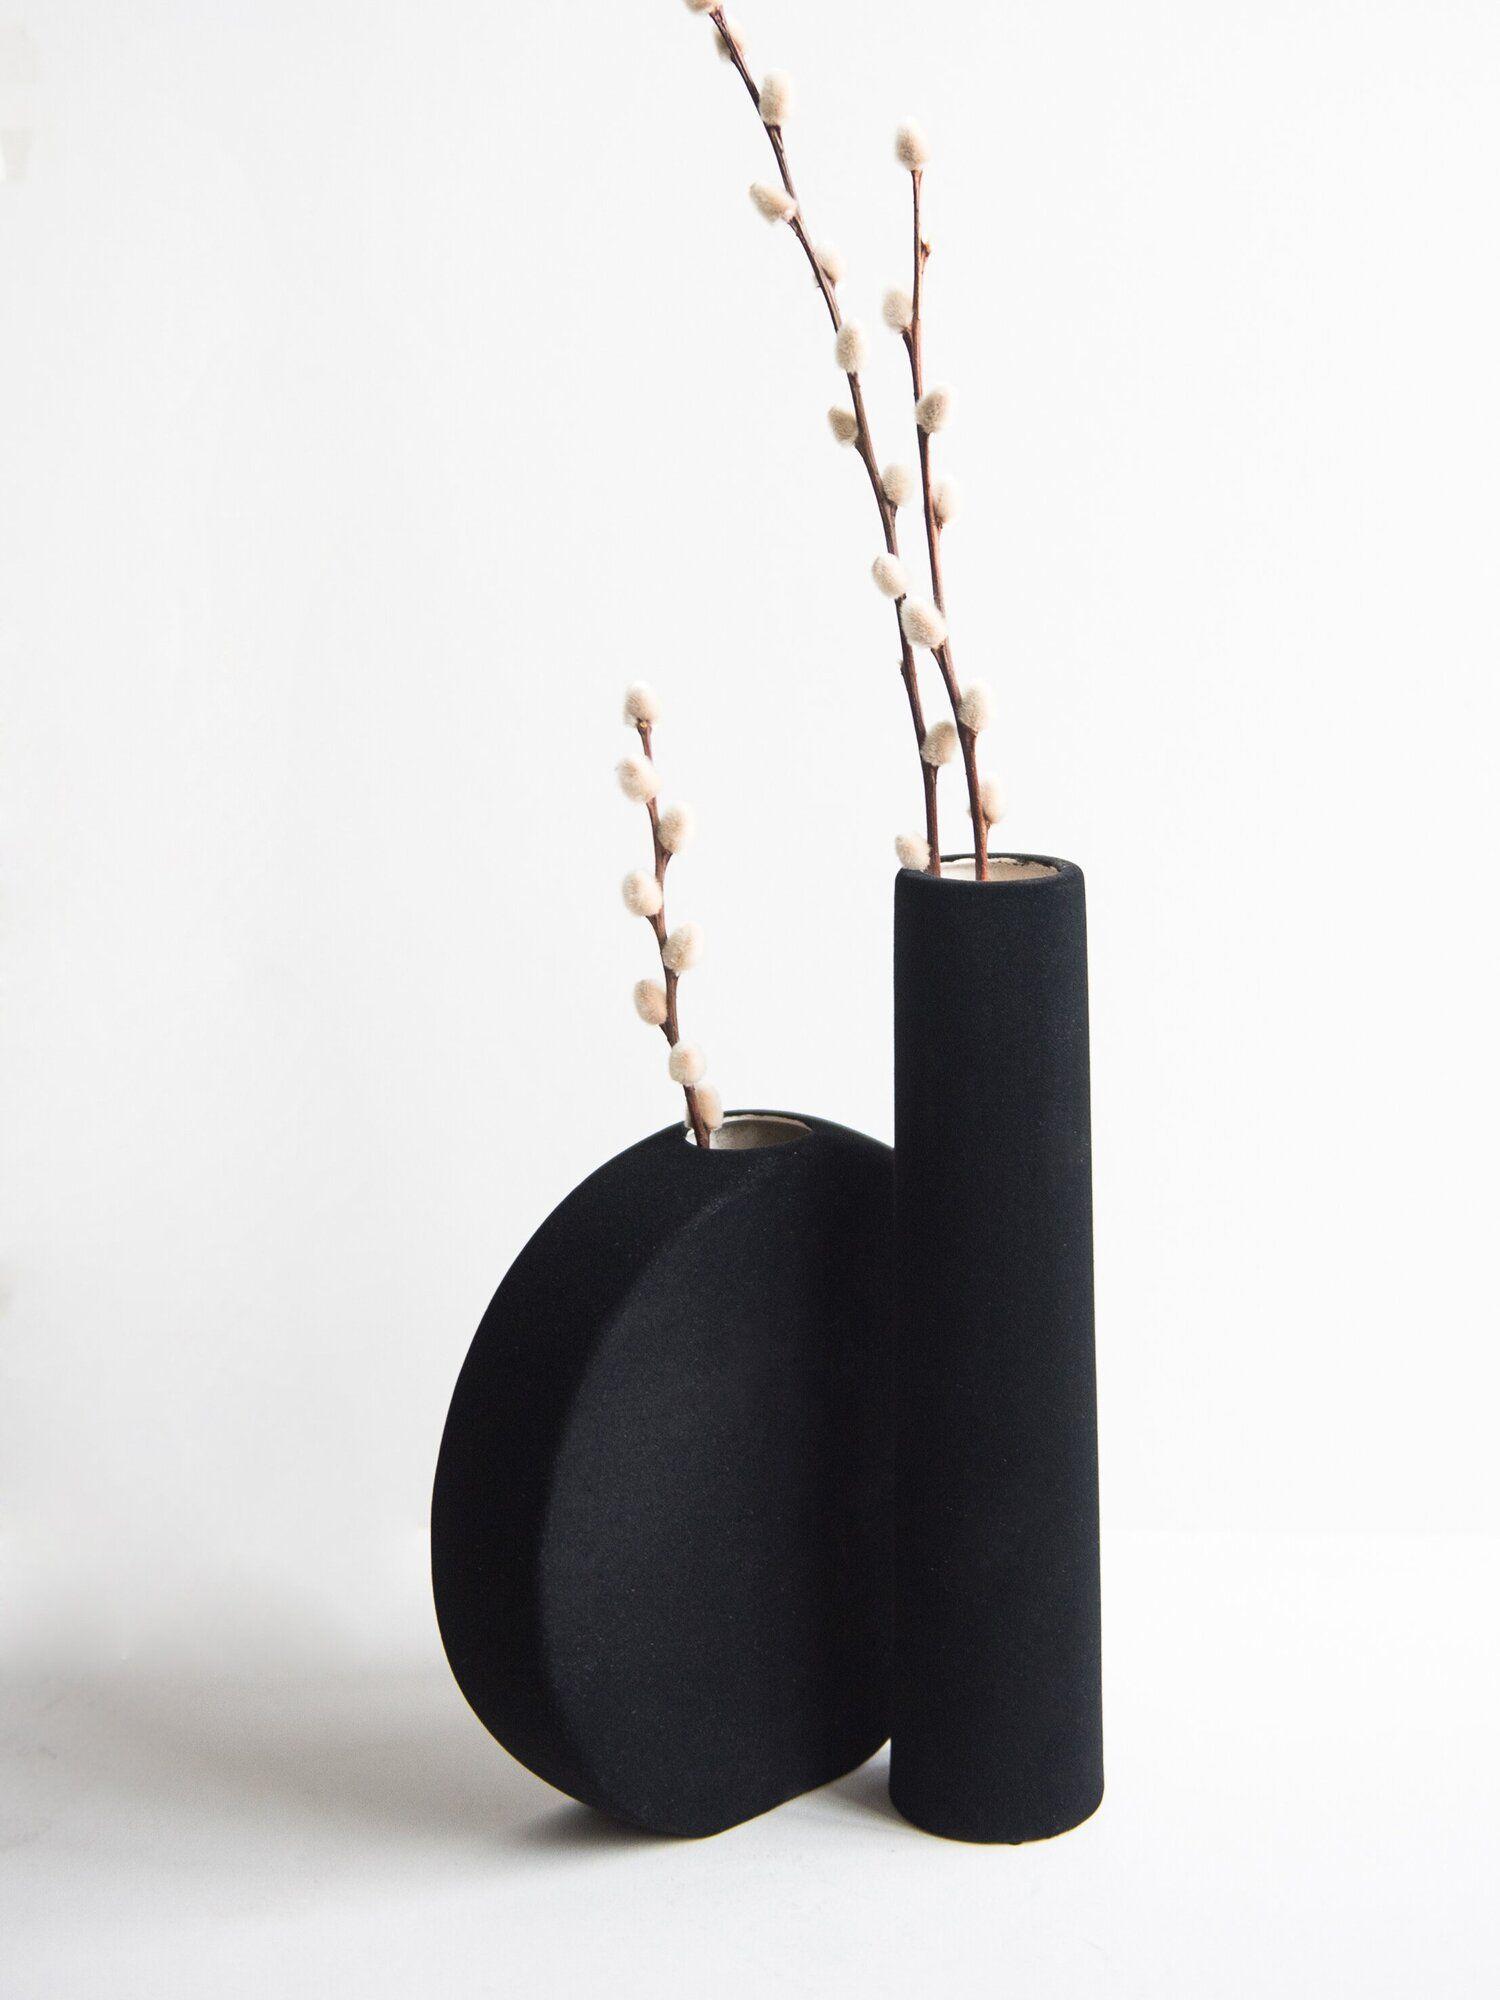 Porcelain Set Of Home Decor Objects Black Decor Black Decor